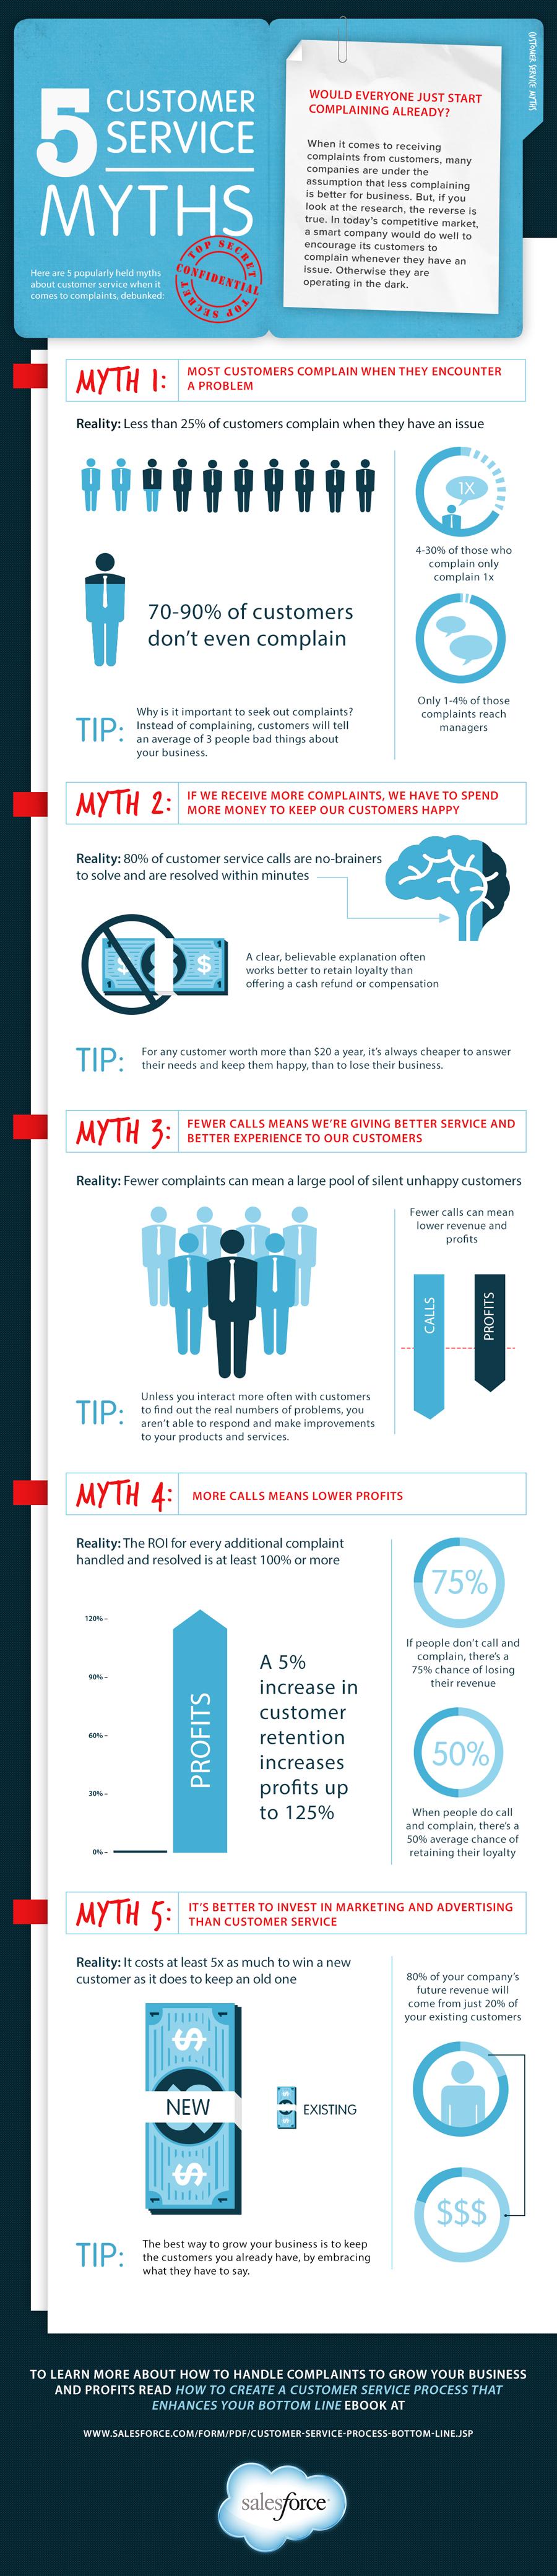 5-customer-service-myths_5216350c5baef